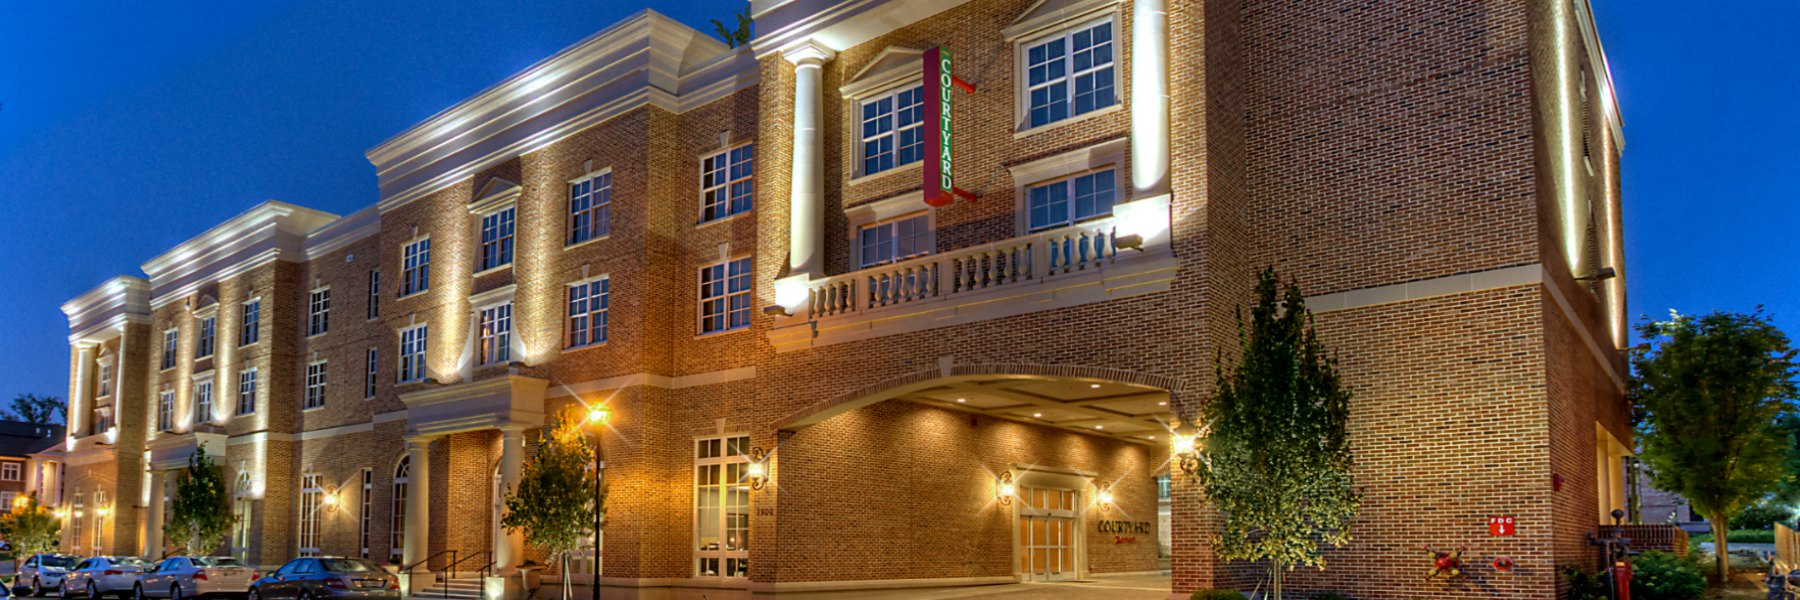 McNeill Hotel Company | Hotel Ownership, Management & Development ...